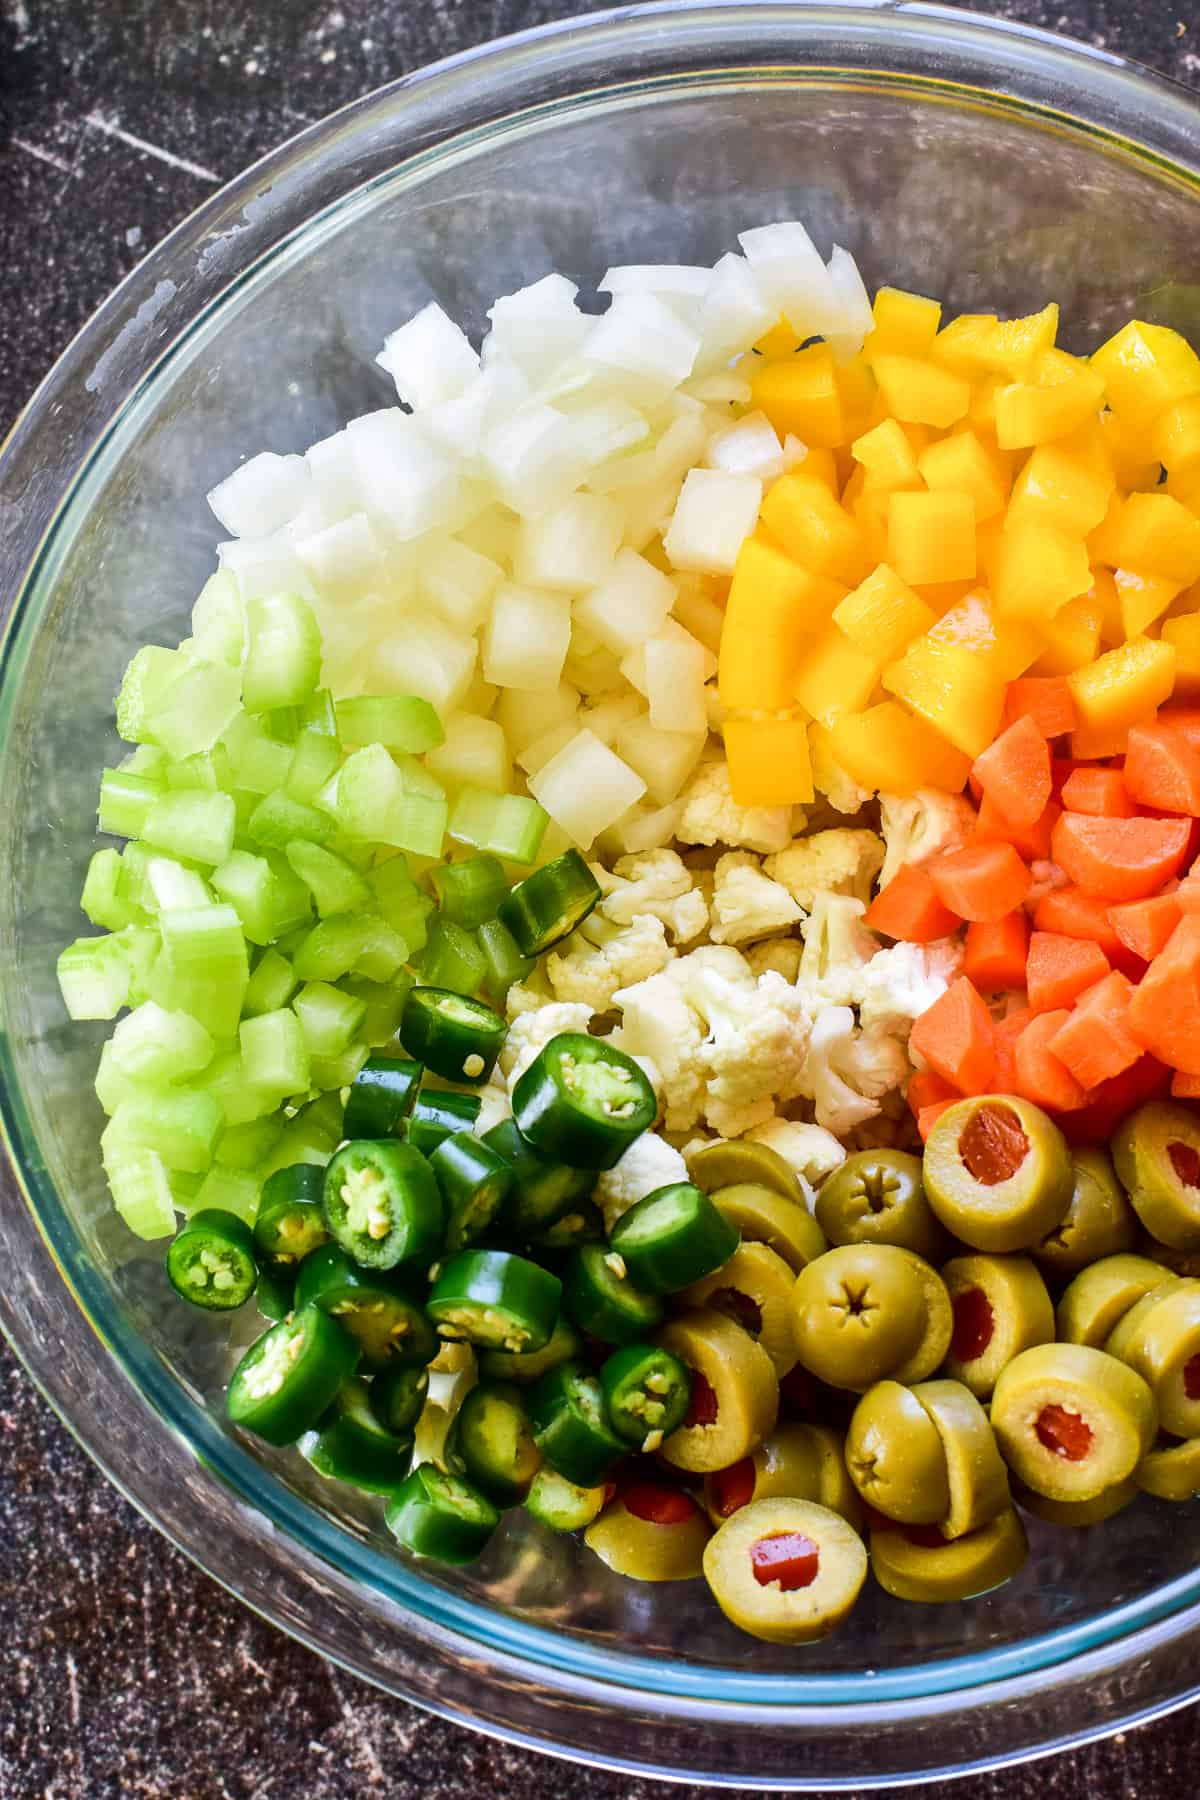 Chopped veggies in glass bowl